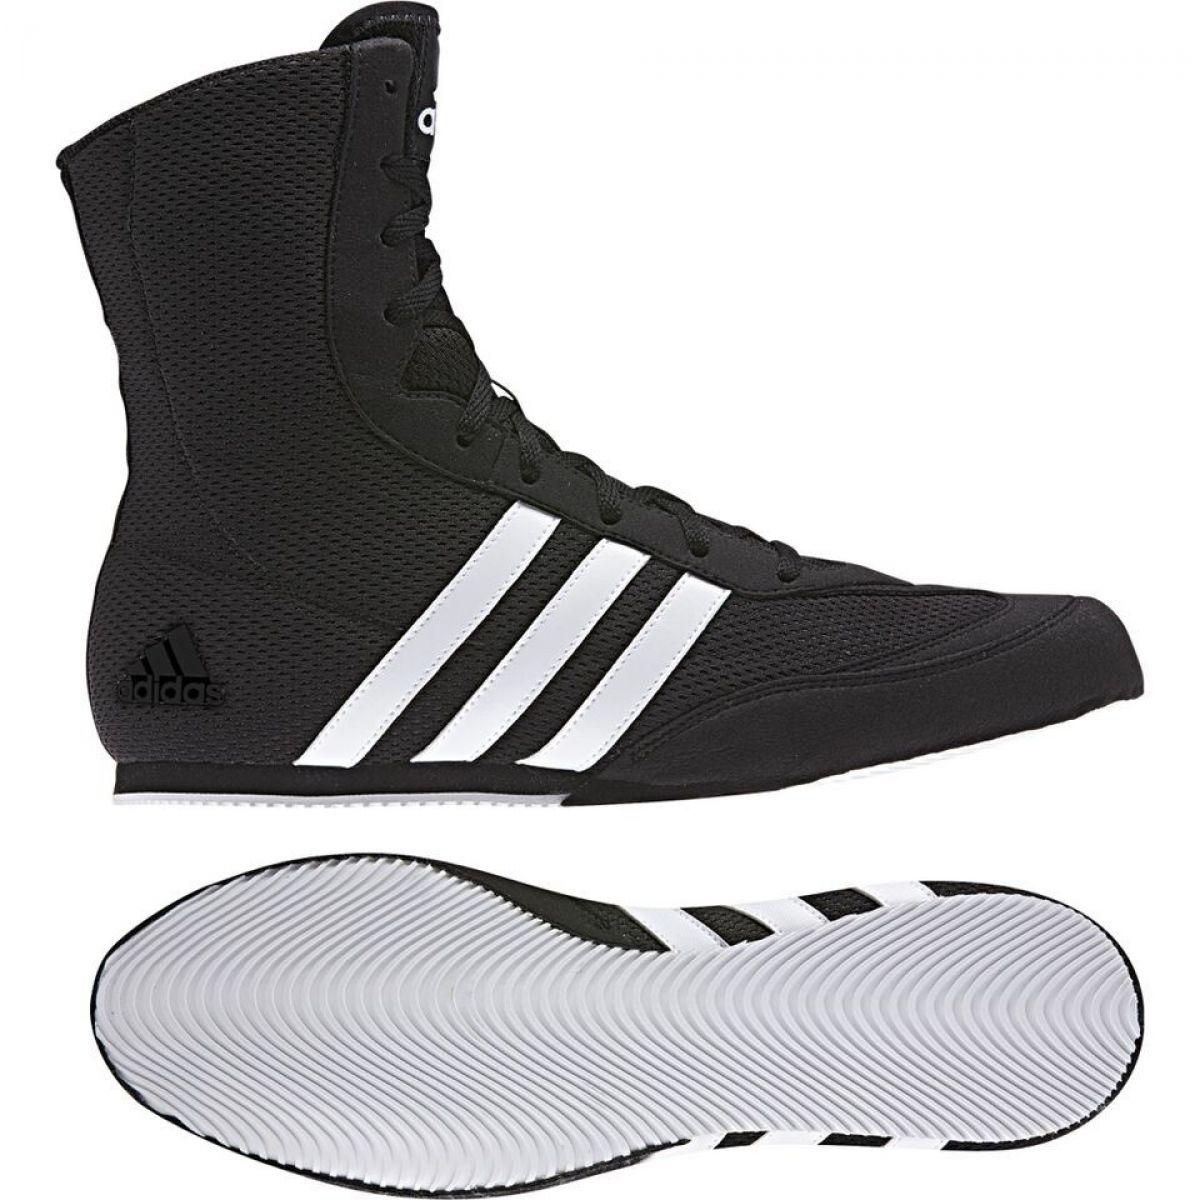 Buty bokserskie adidas Box Hog II 10.5 ( 45 13